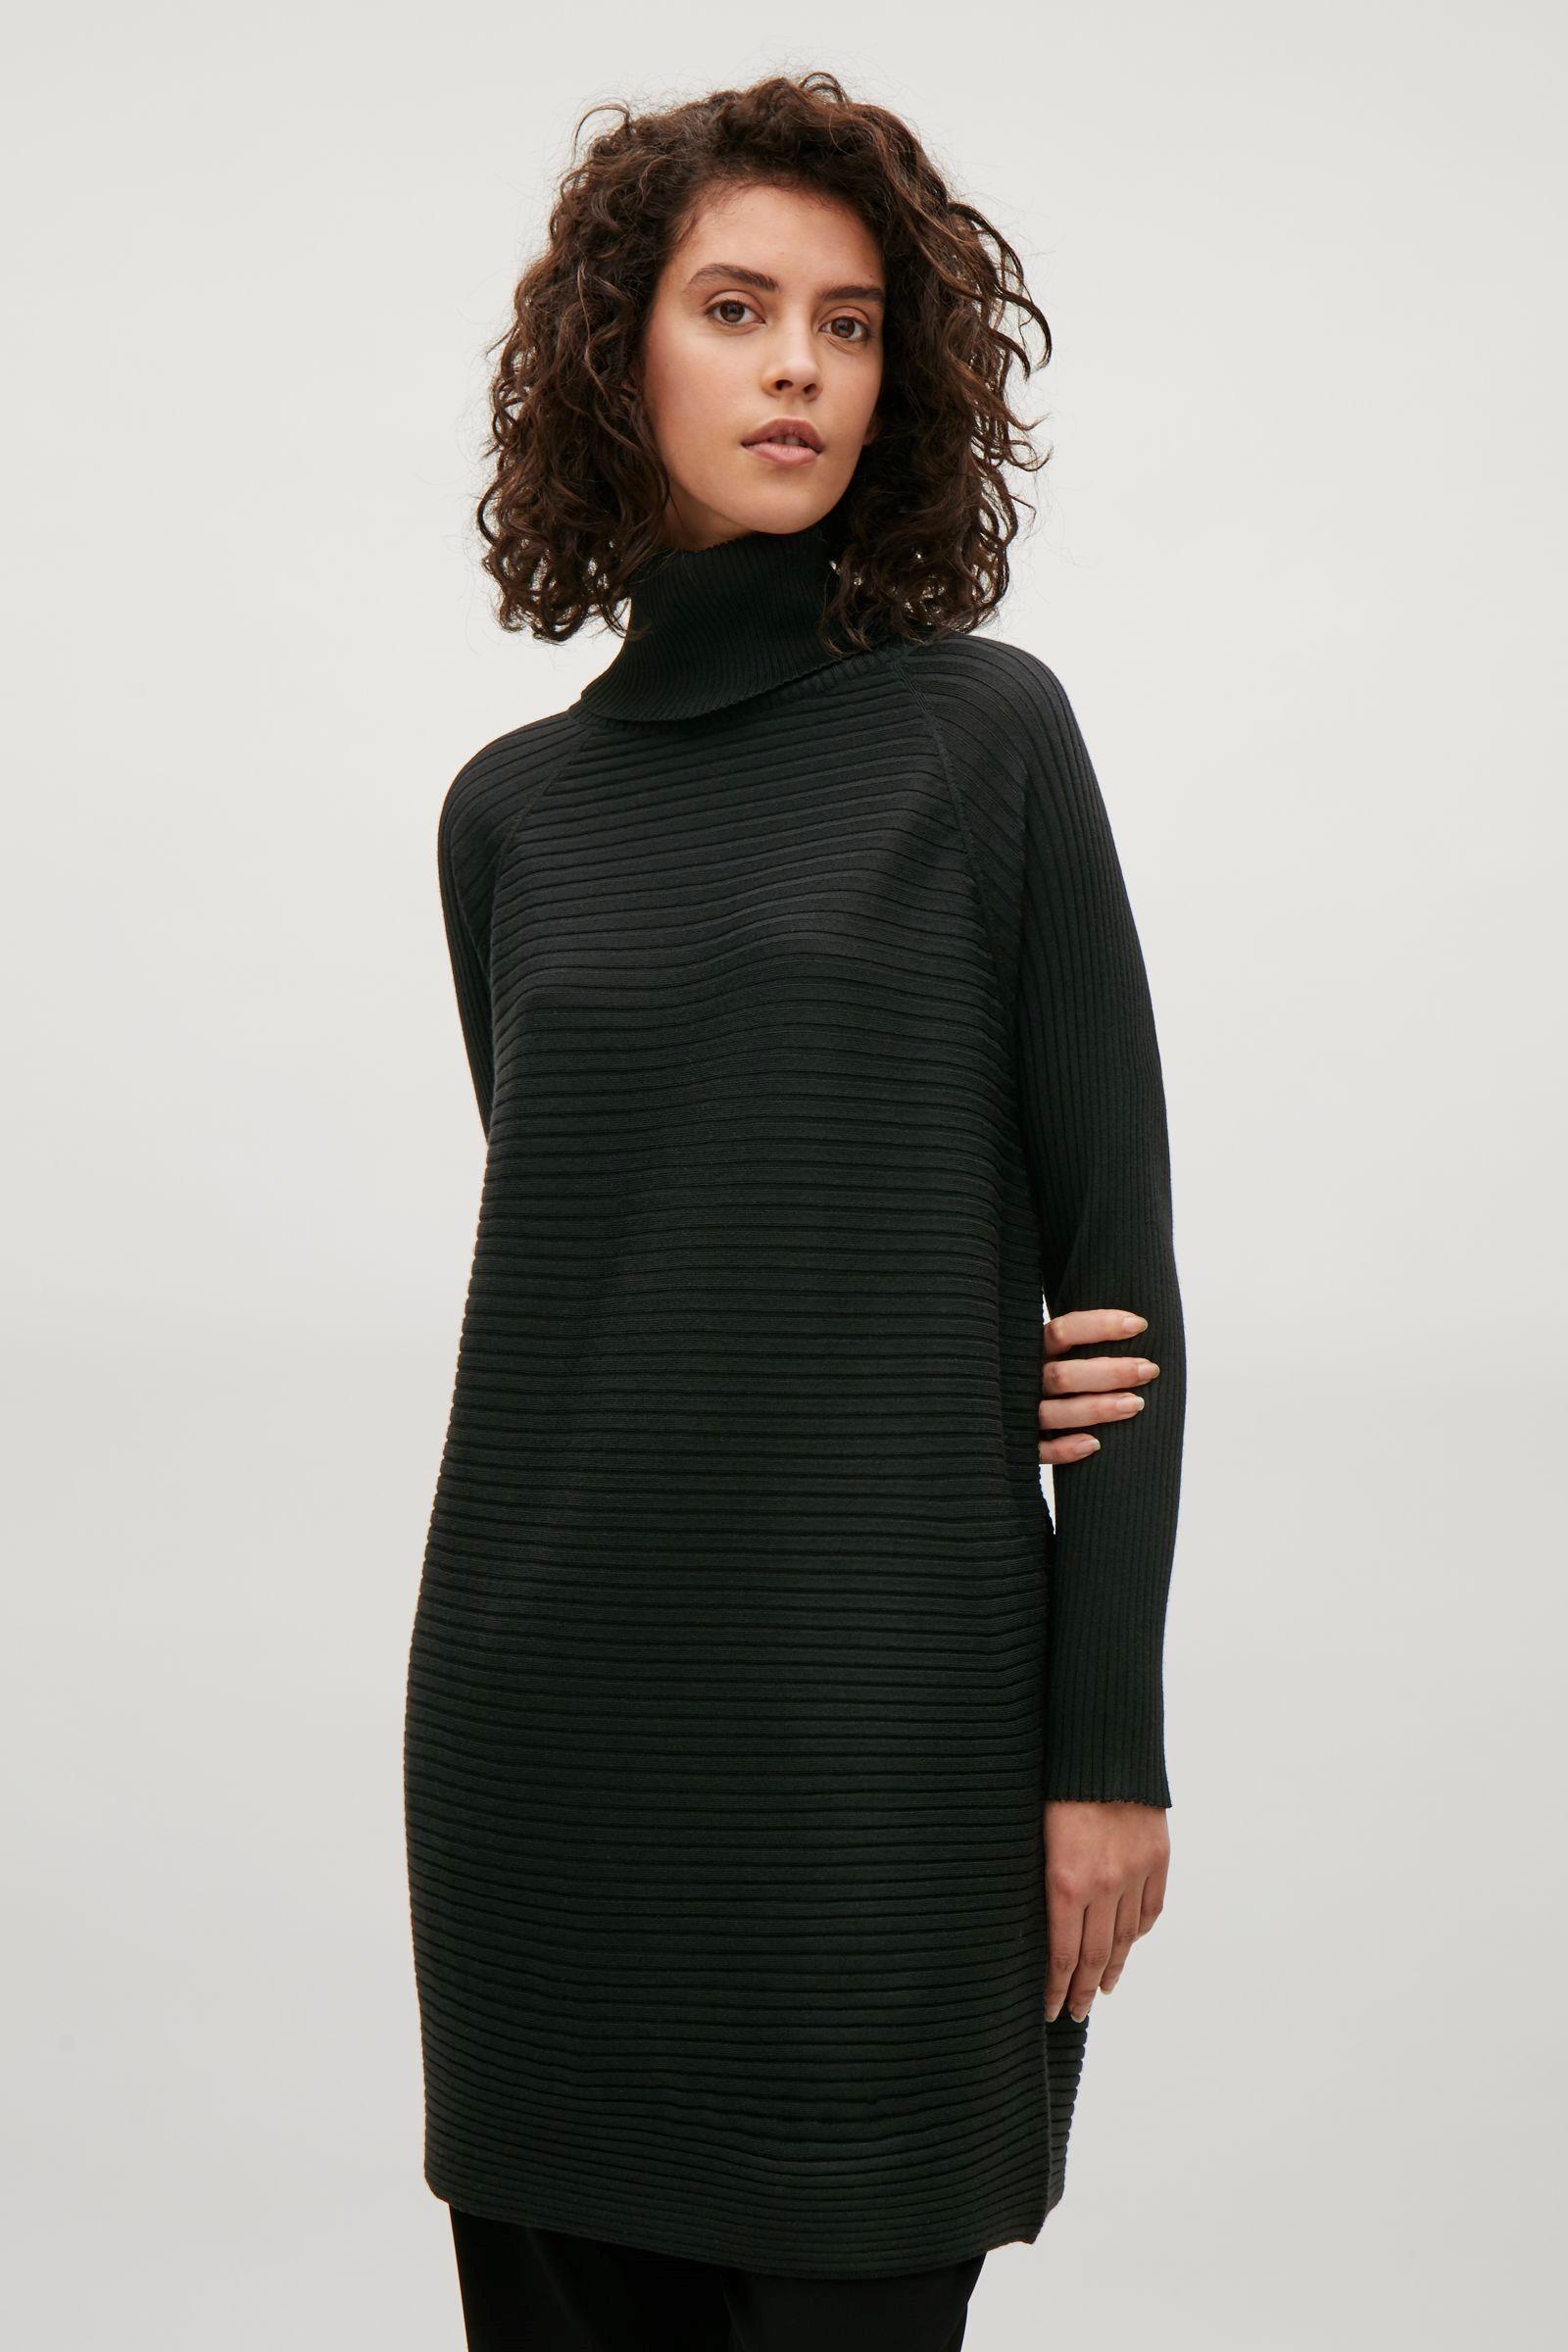 Cos image of merino rollneck dress in black autumn winter